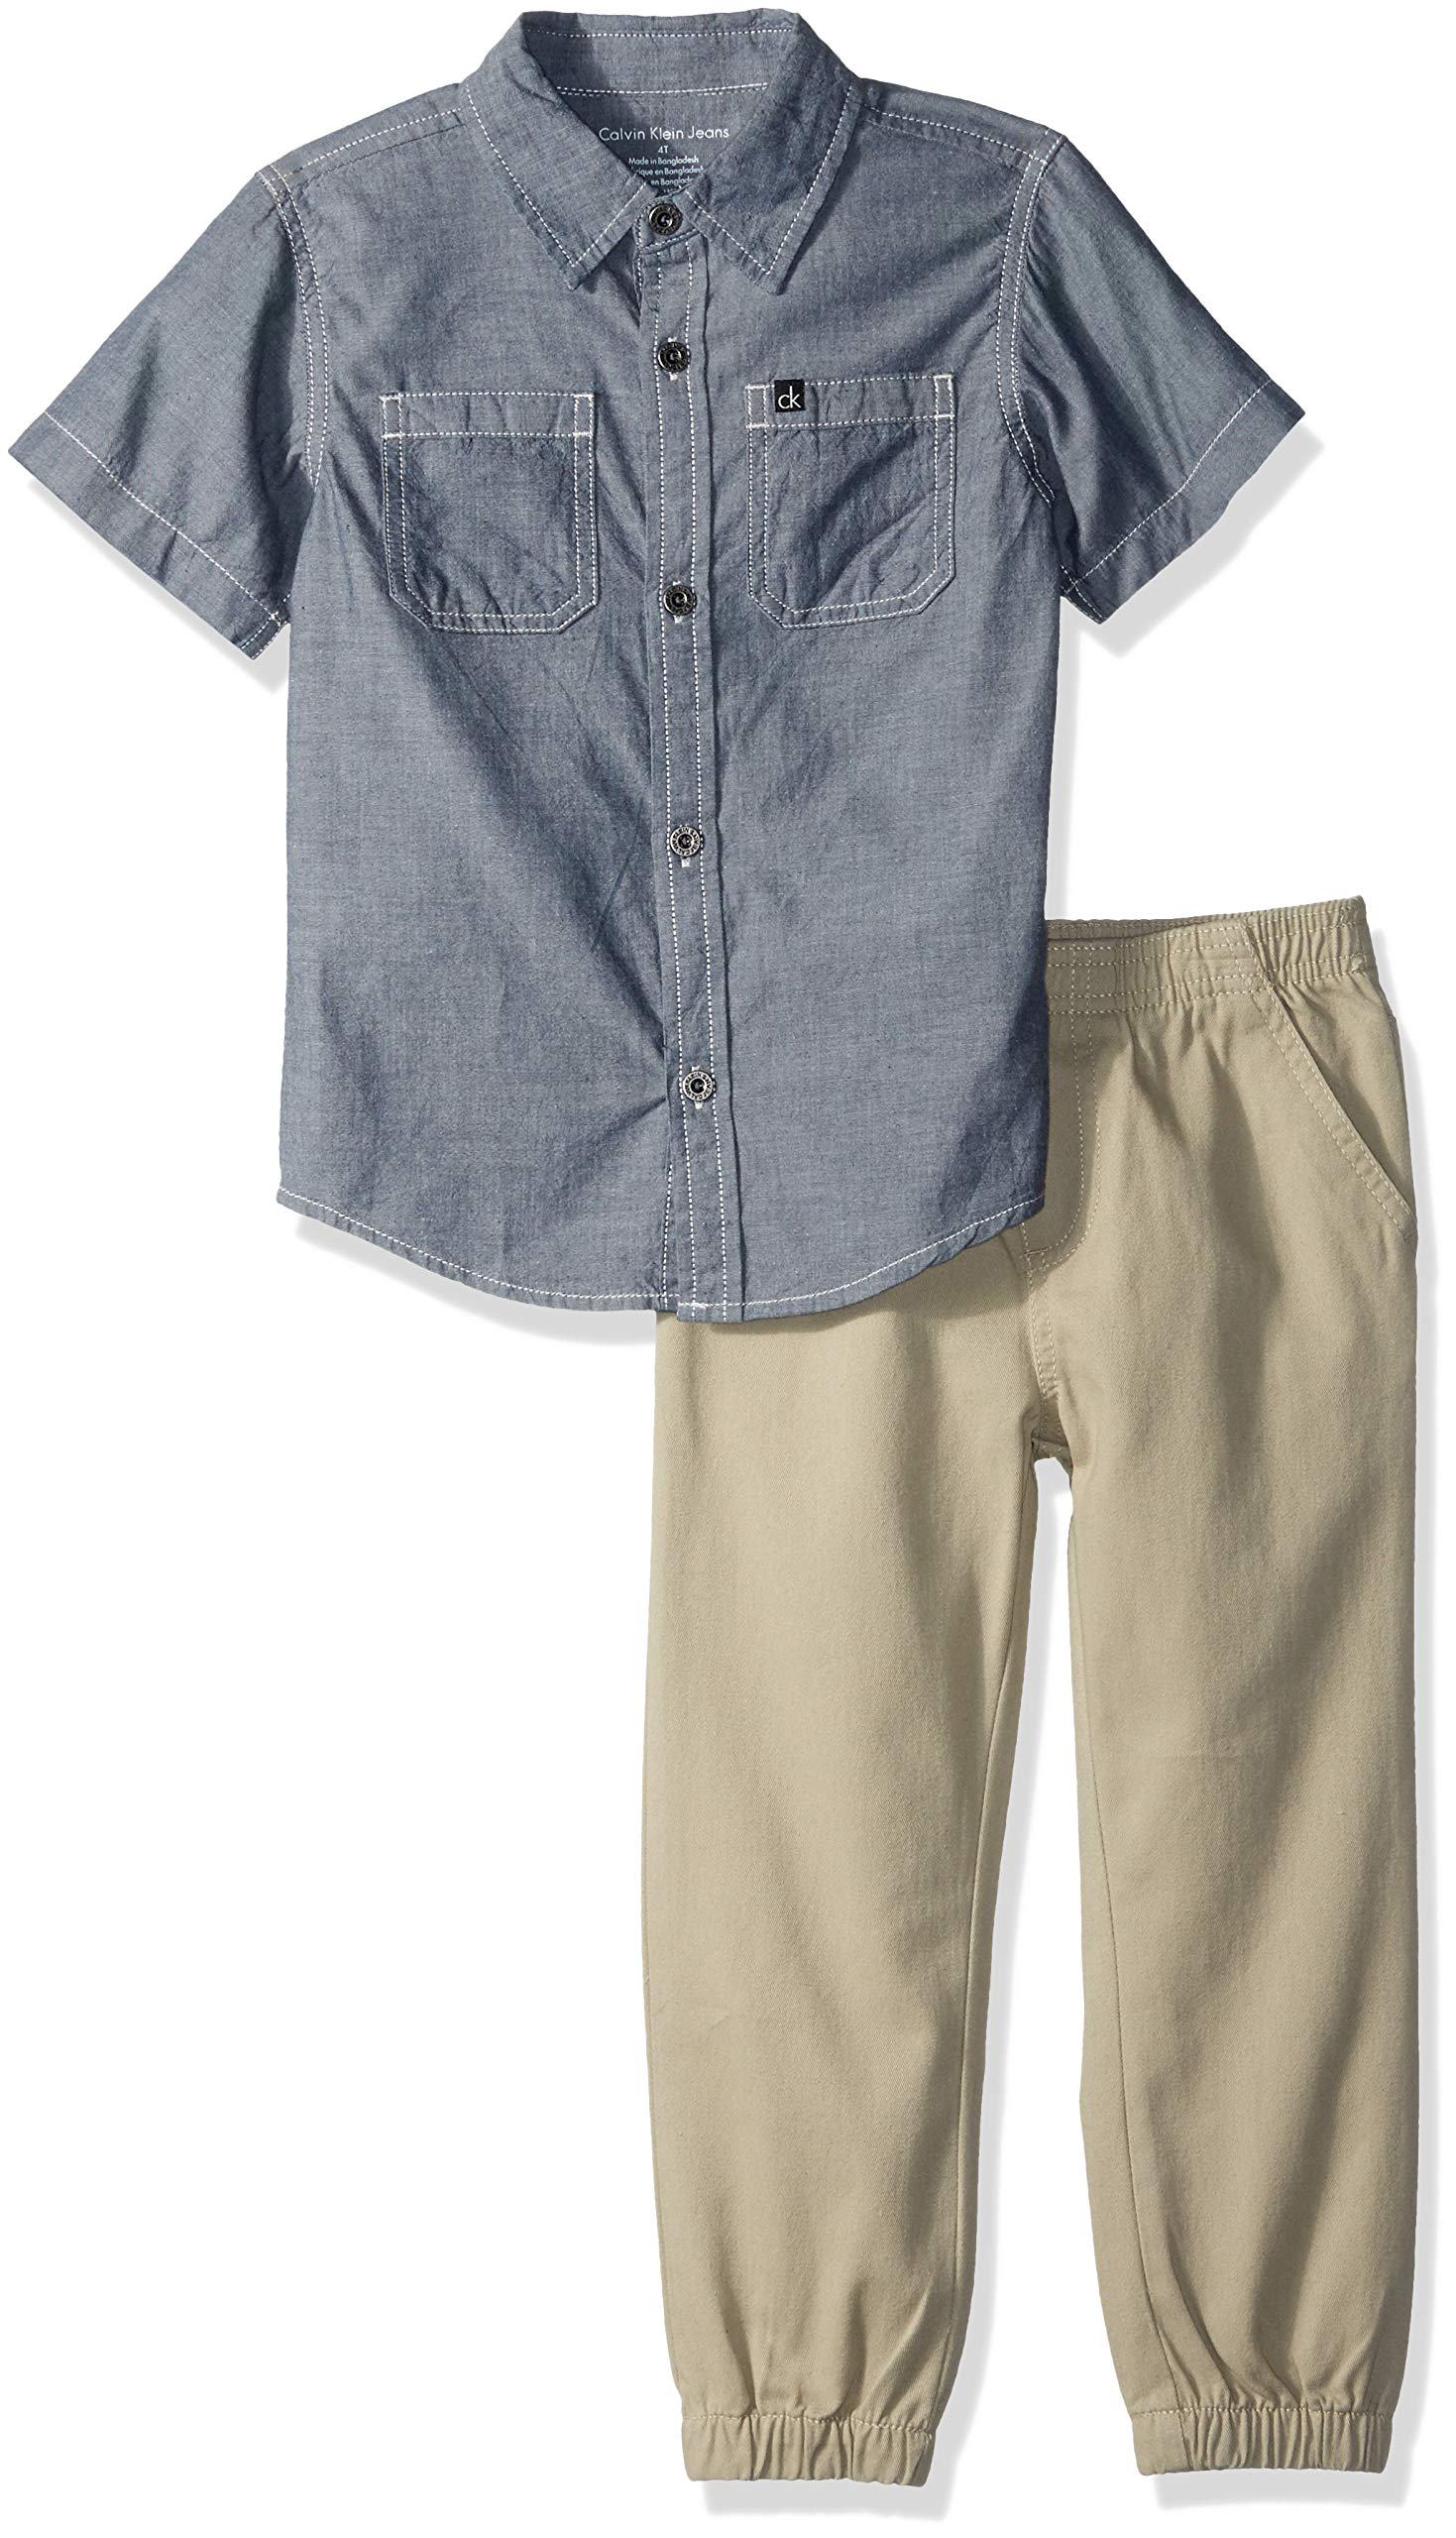 Calvin Klein Boys' Toddler 2 Pieces Shirt Pant Set-Short Sleeves, Blue Denim, 2T